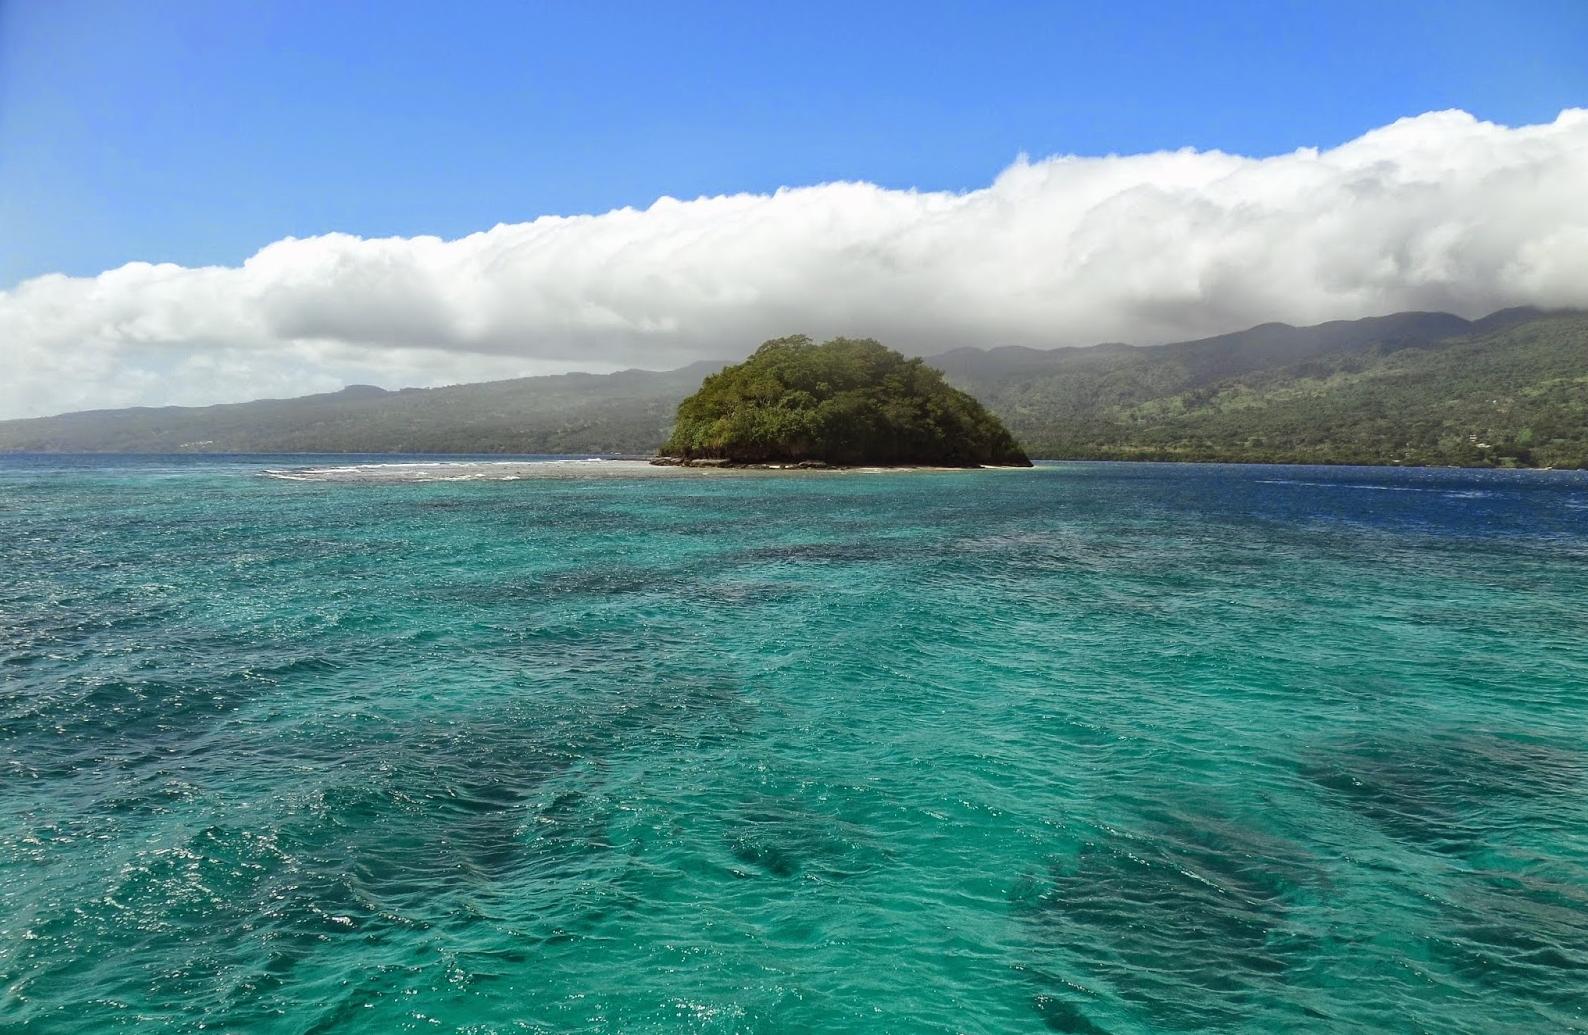 Koro Levu Island - Fiji, South Pacific - Private Islands for Sale